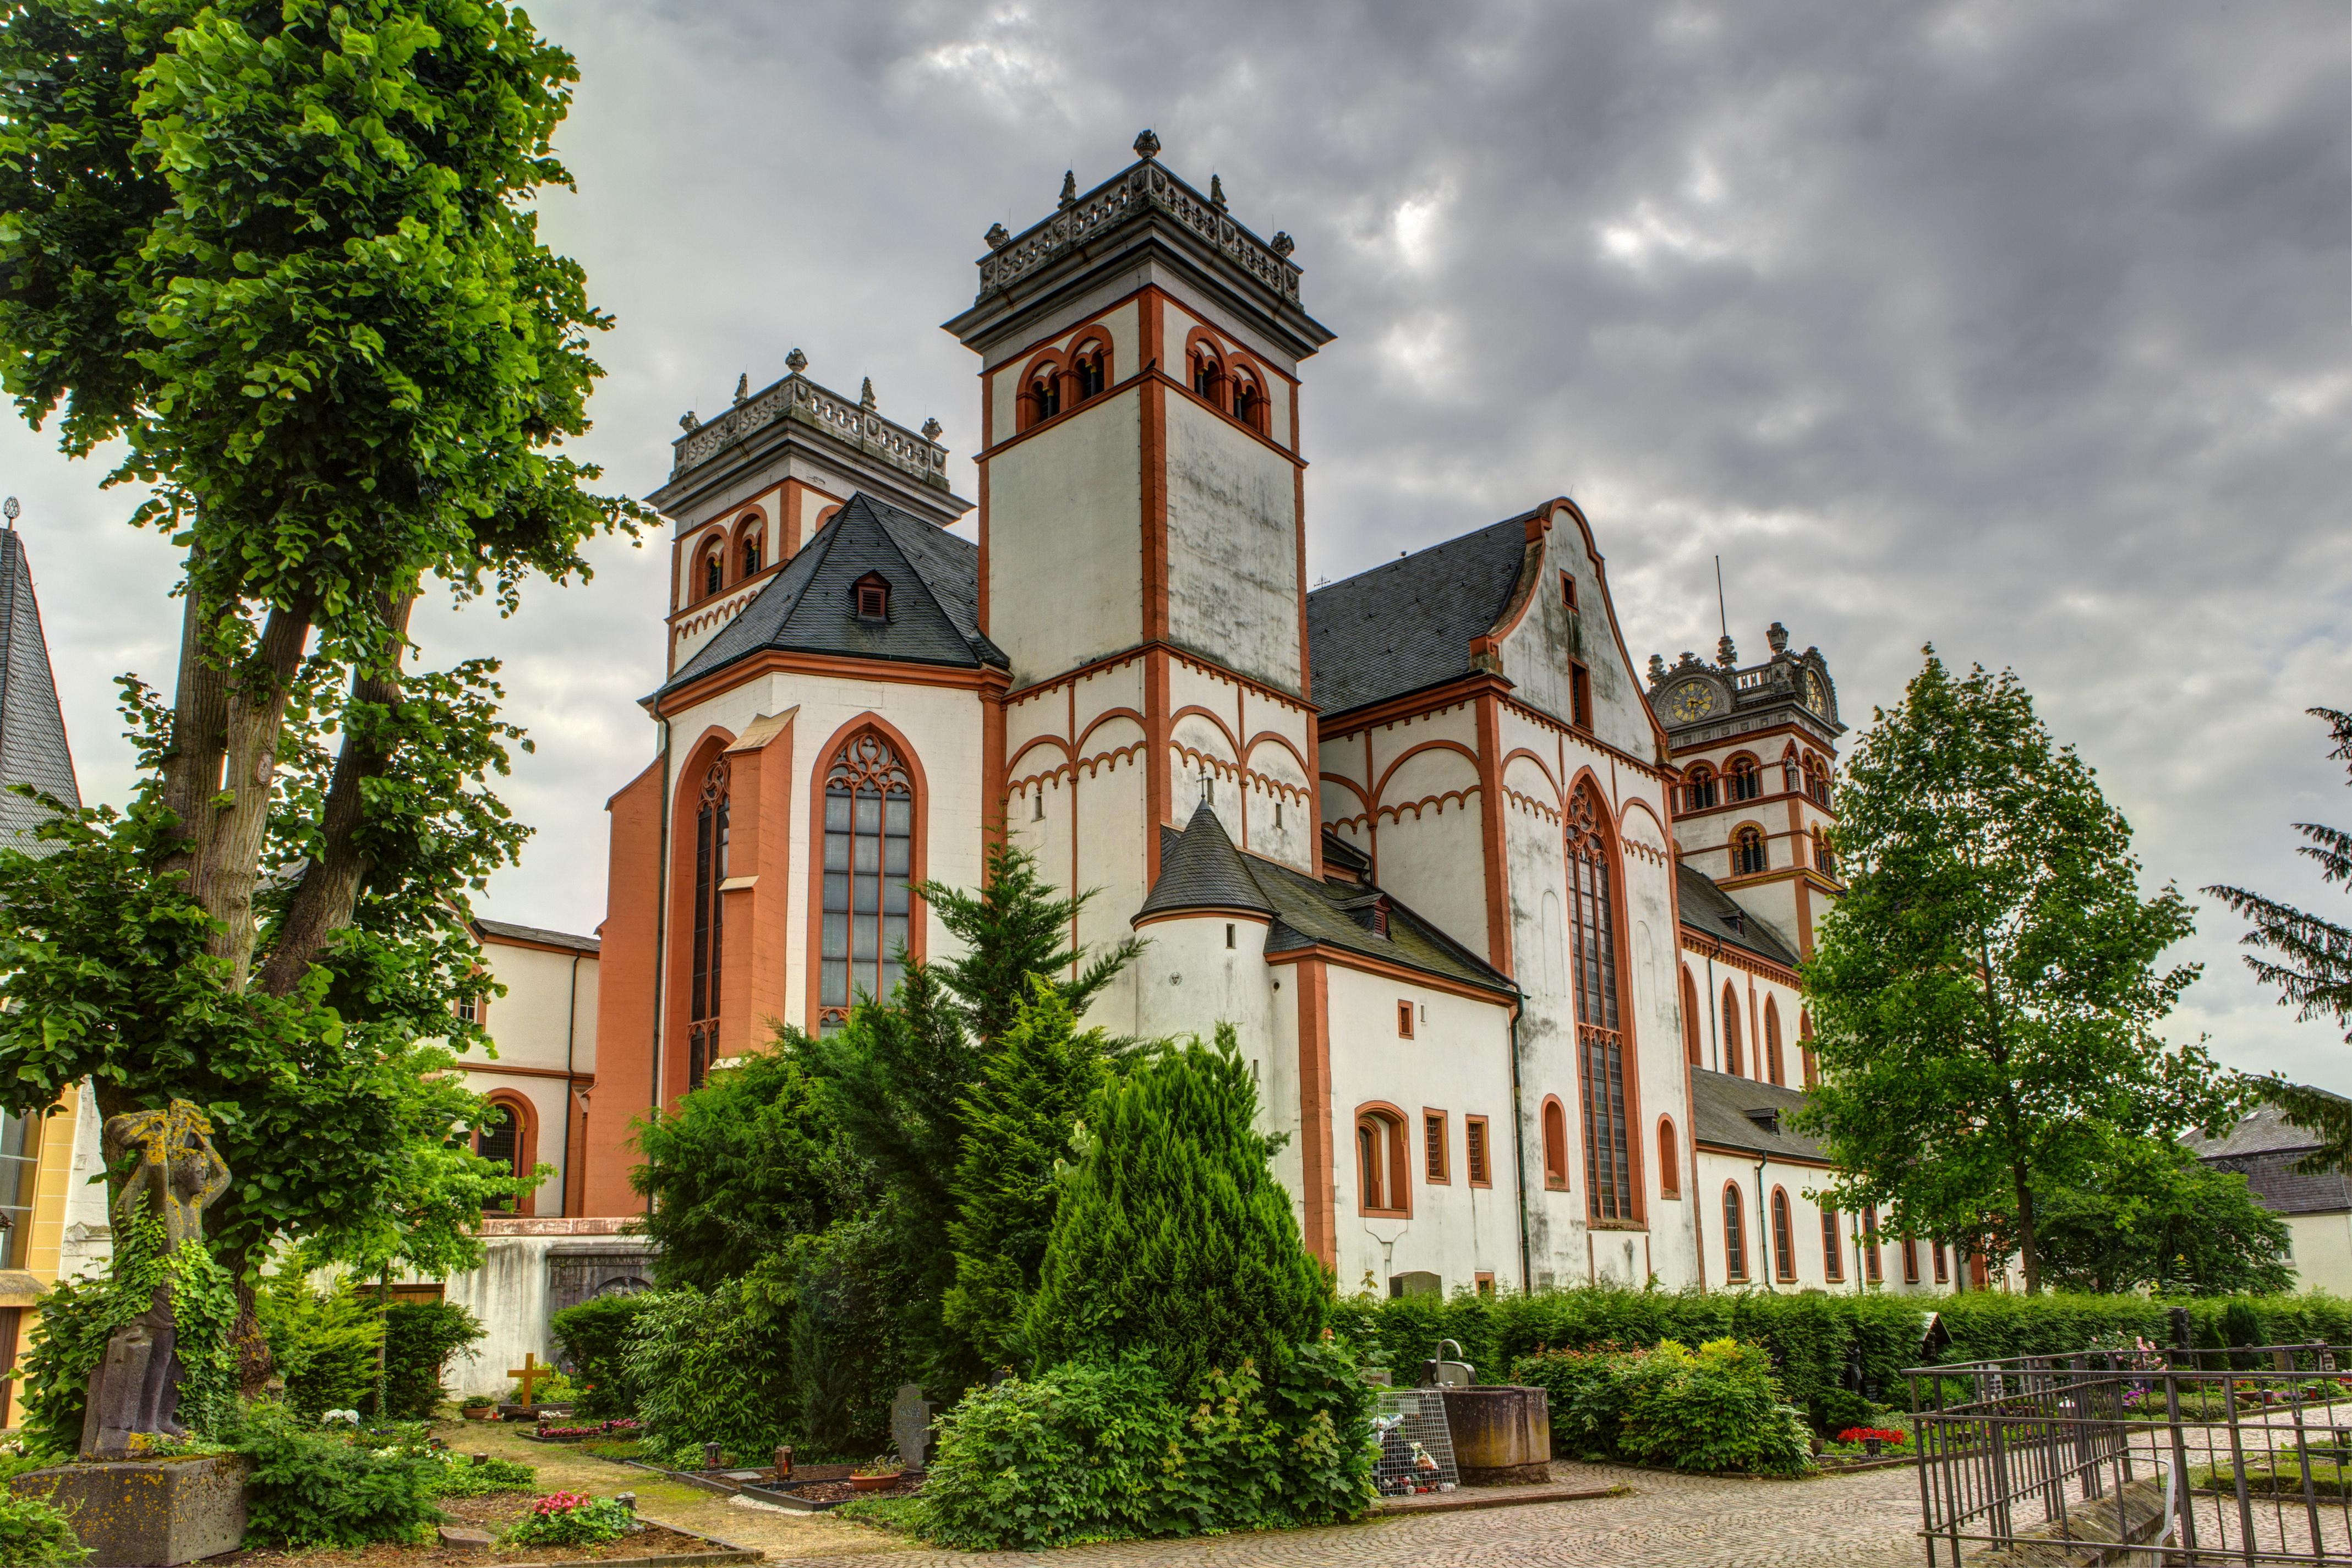 страны архитектура Собор Трир Германия бесплатно